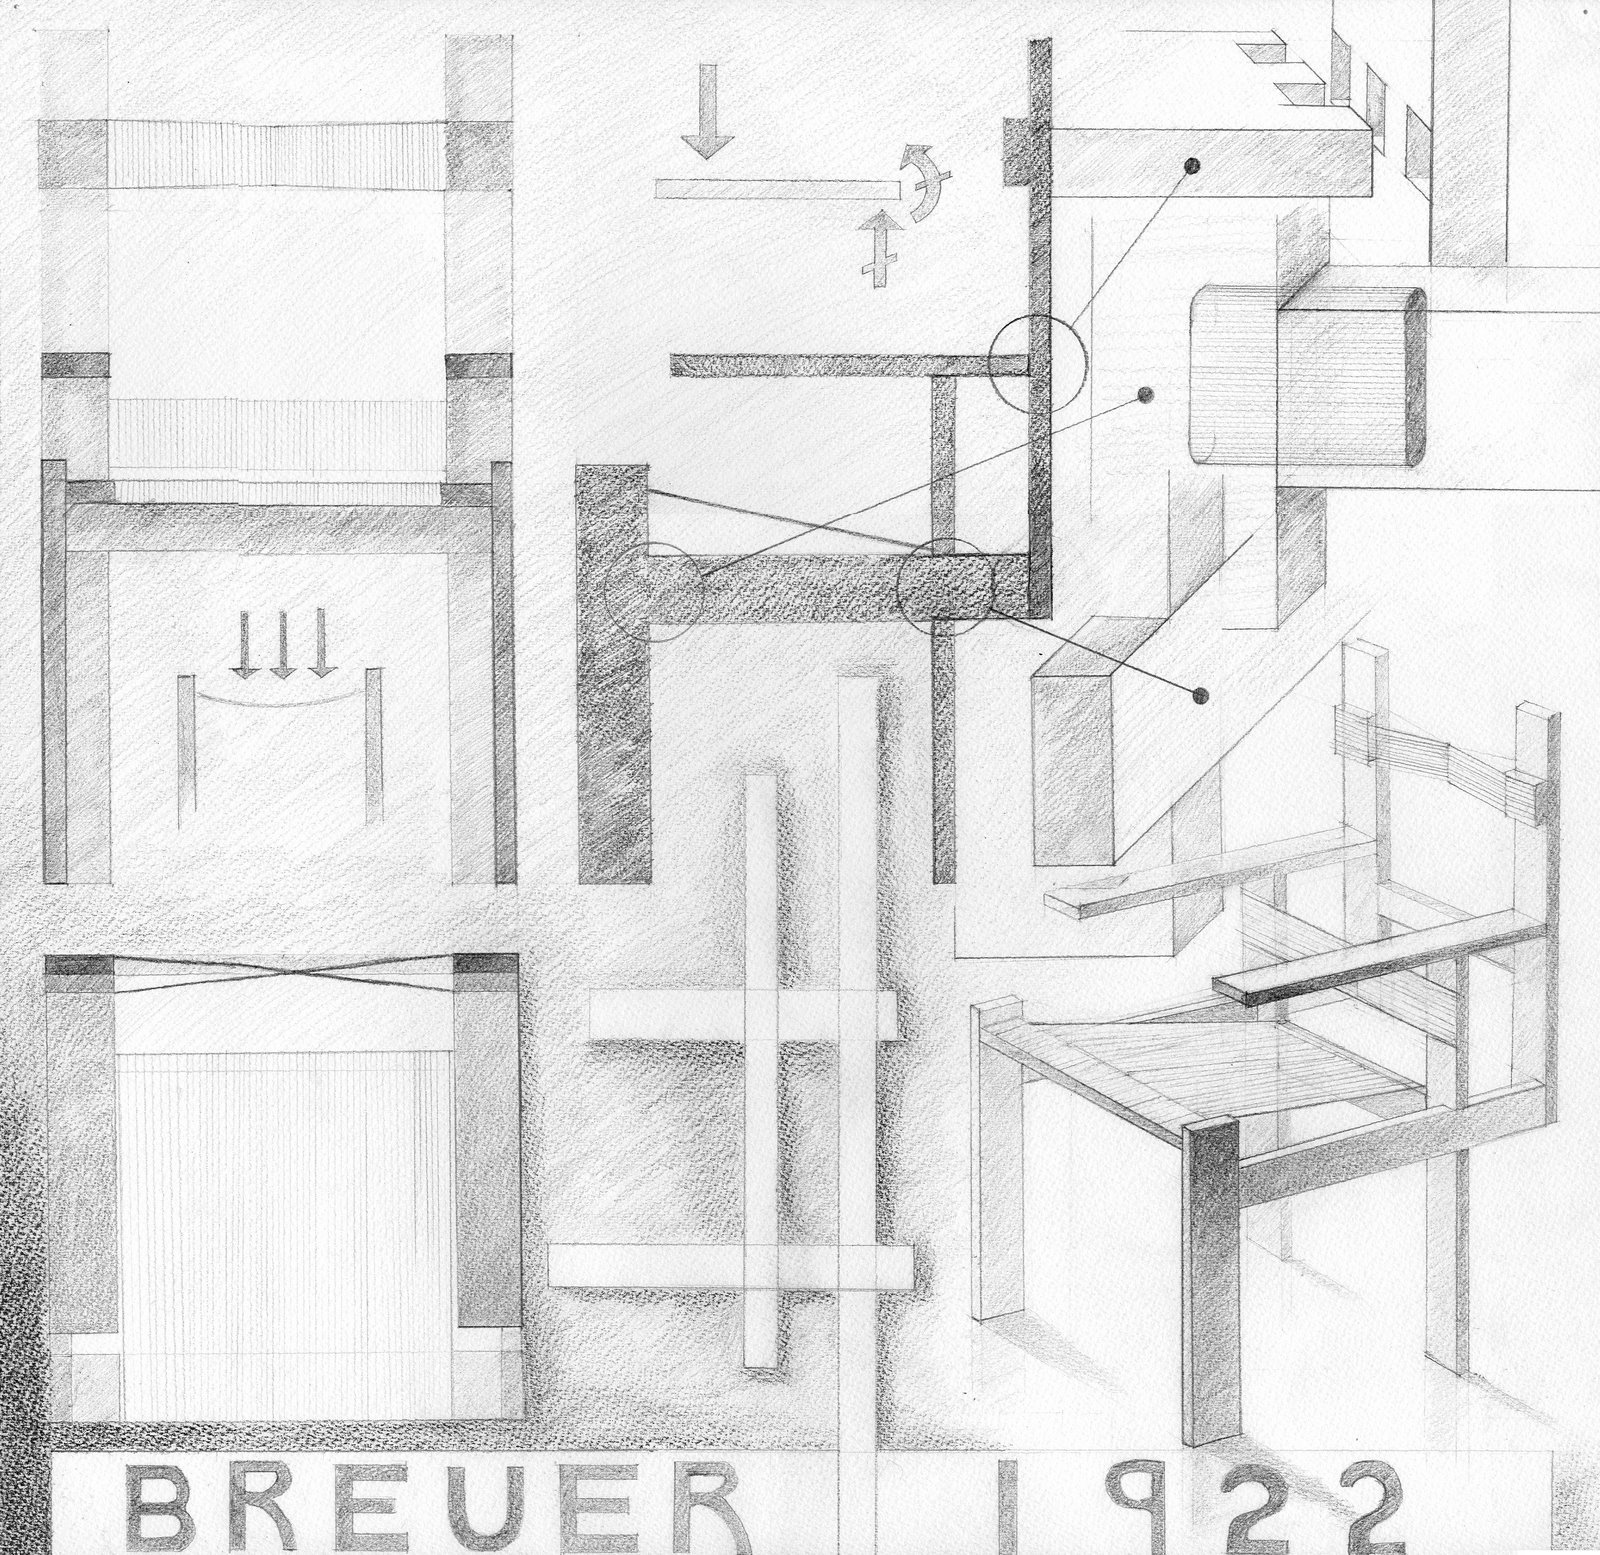 Marcel Breuer Cesca Chair With Armrests Wood Frame Beach Chairs Mēbeļu Vēsture - Izcilākie Meistari: Marsels Breiers